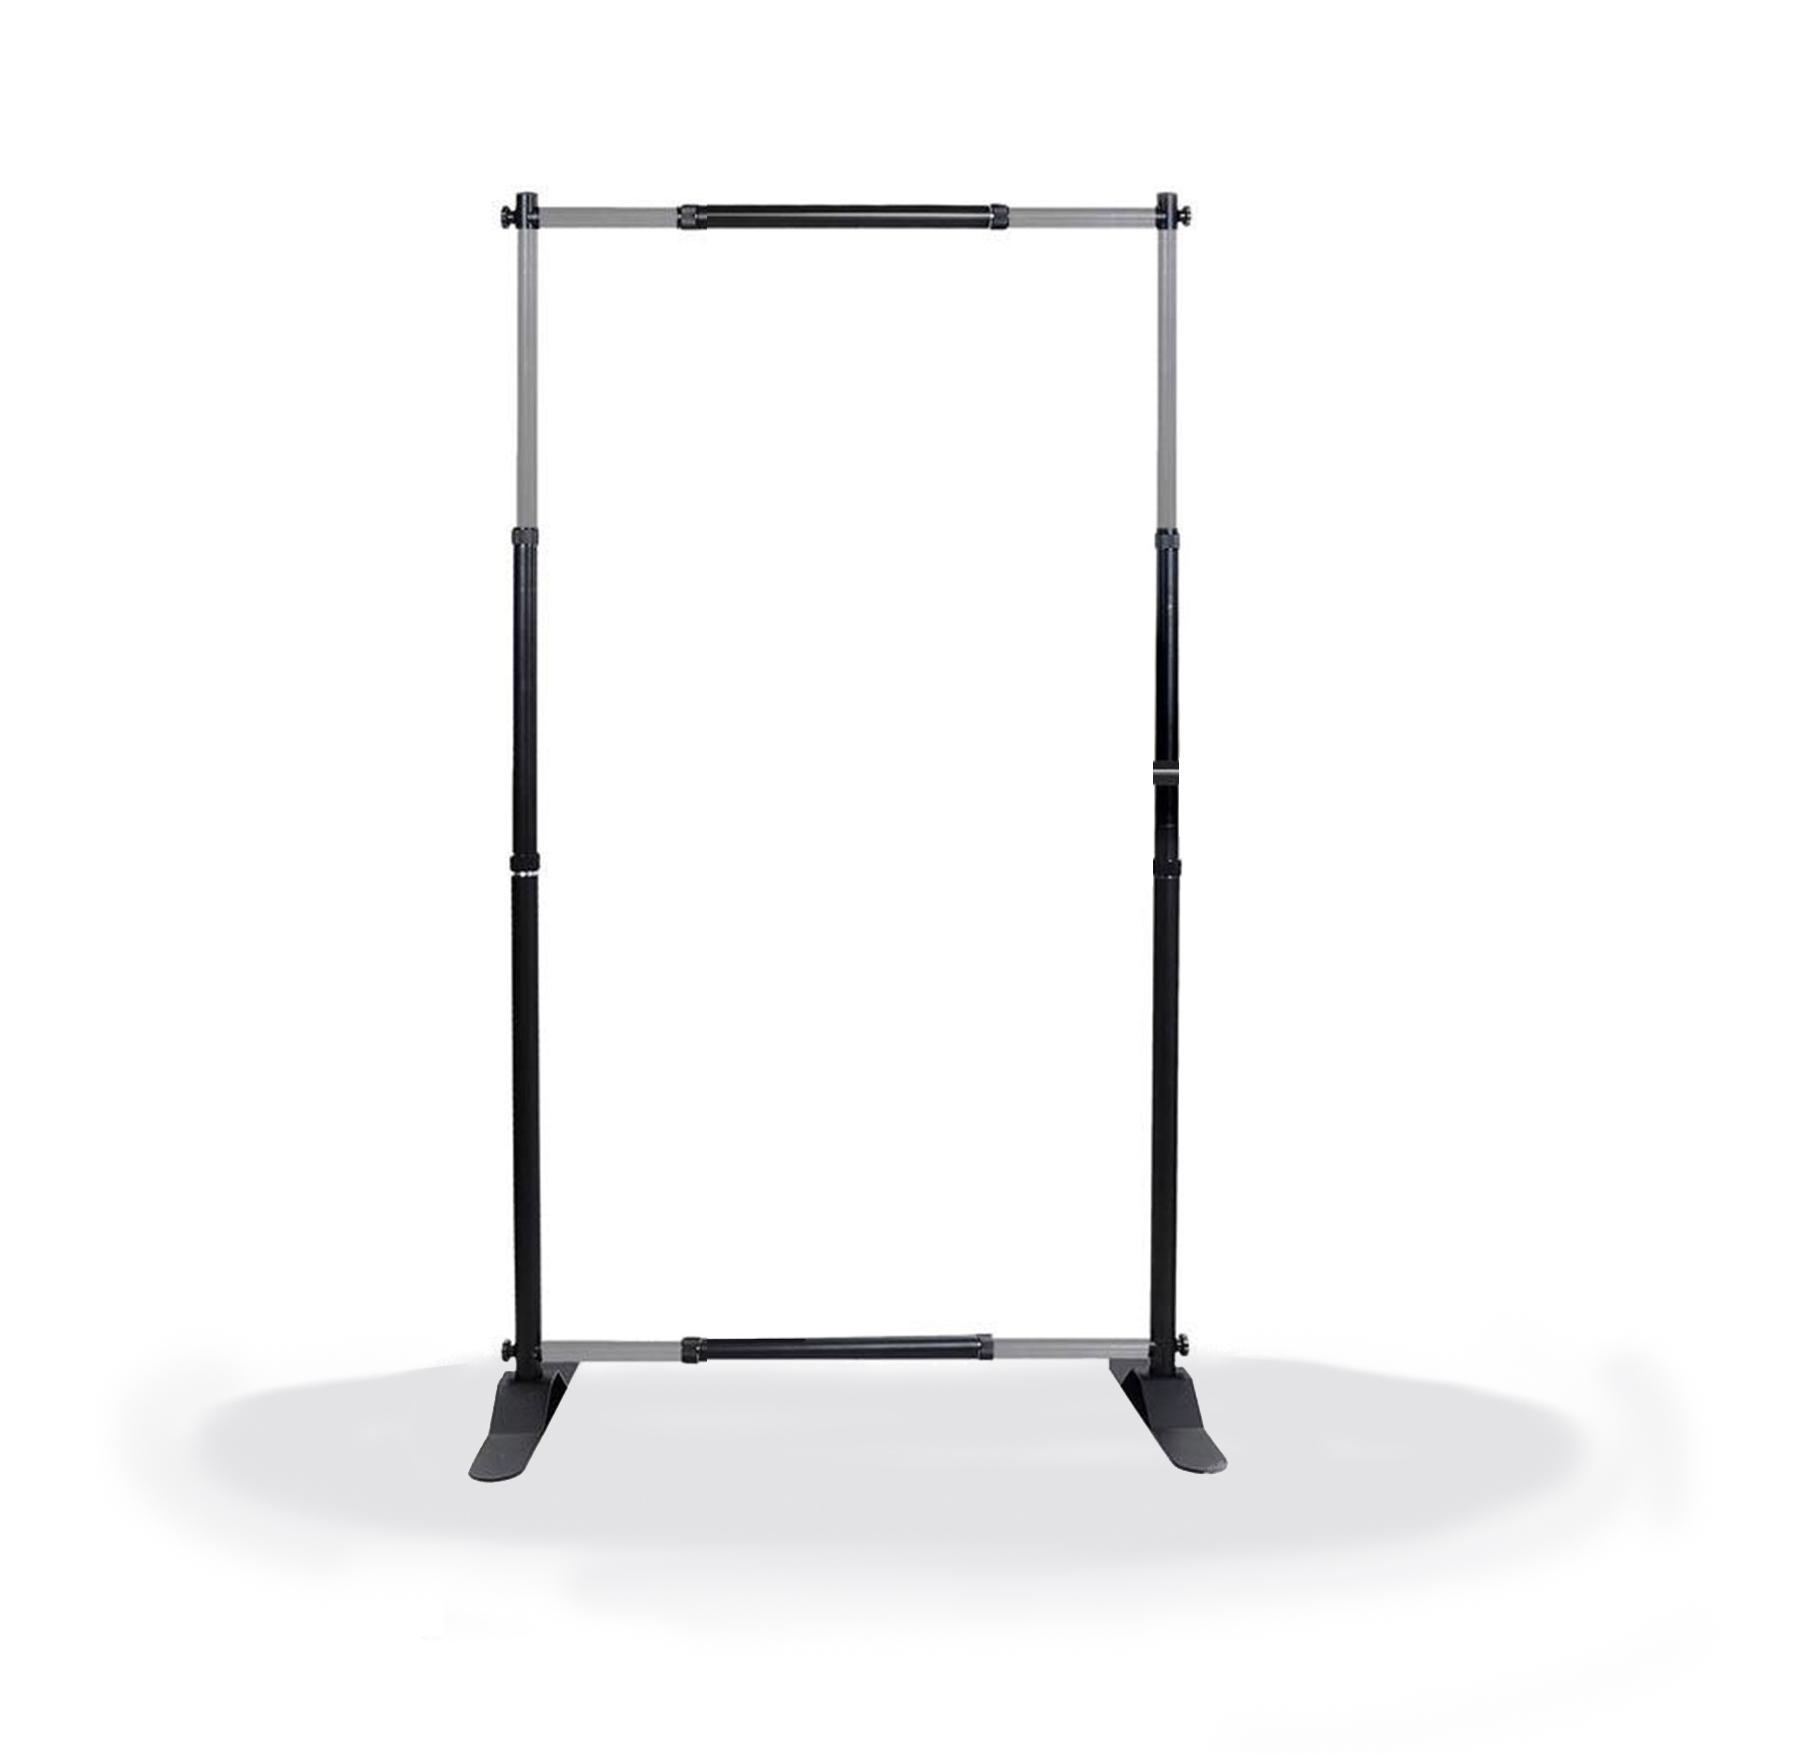 8x4 8x8 telescoping stand adjustable